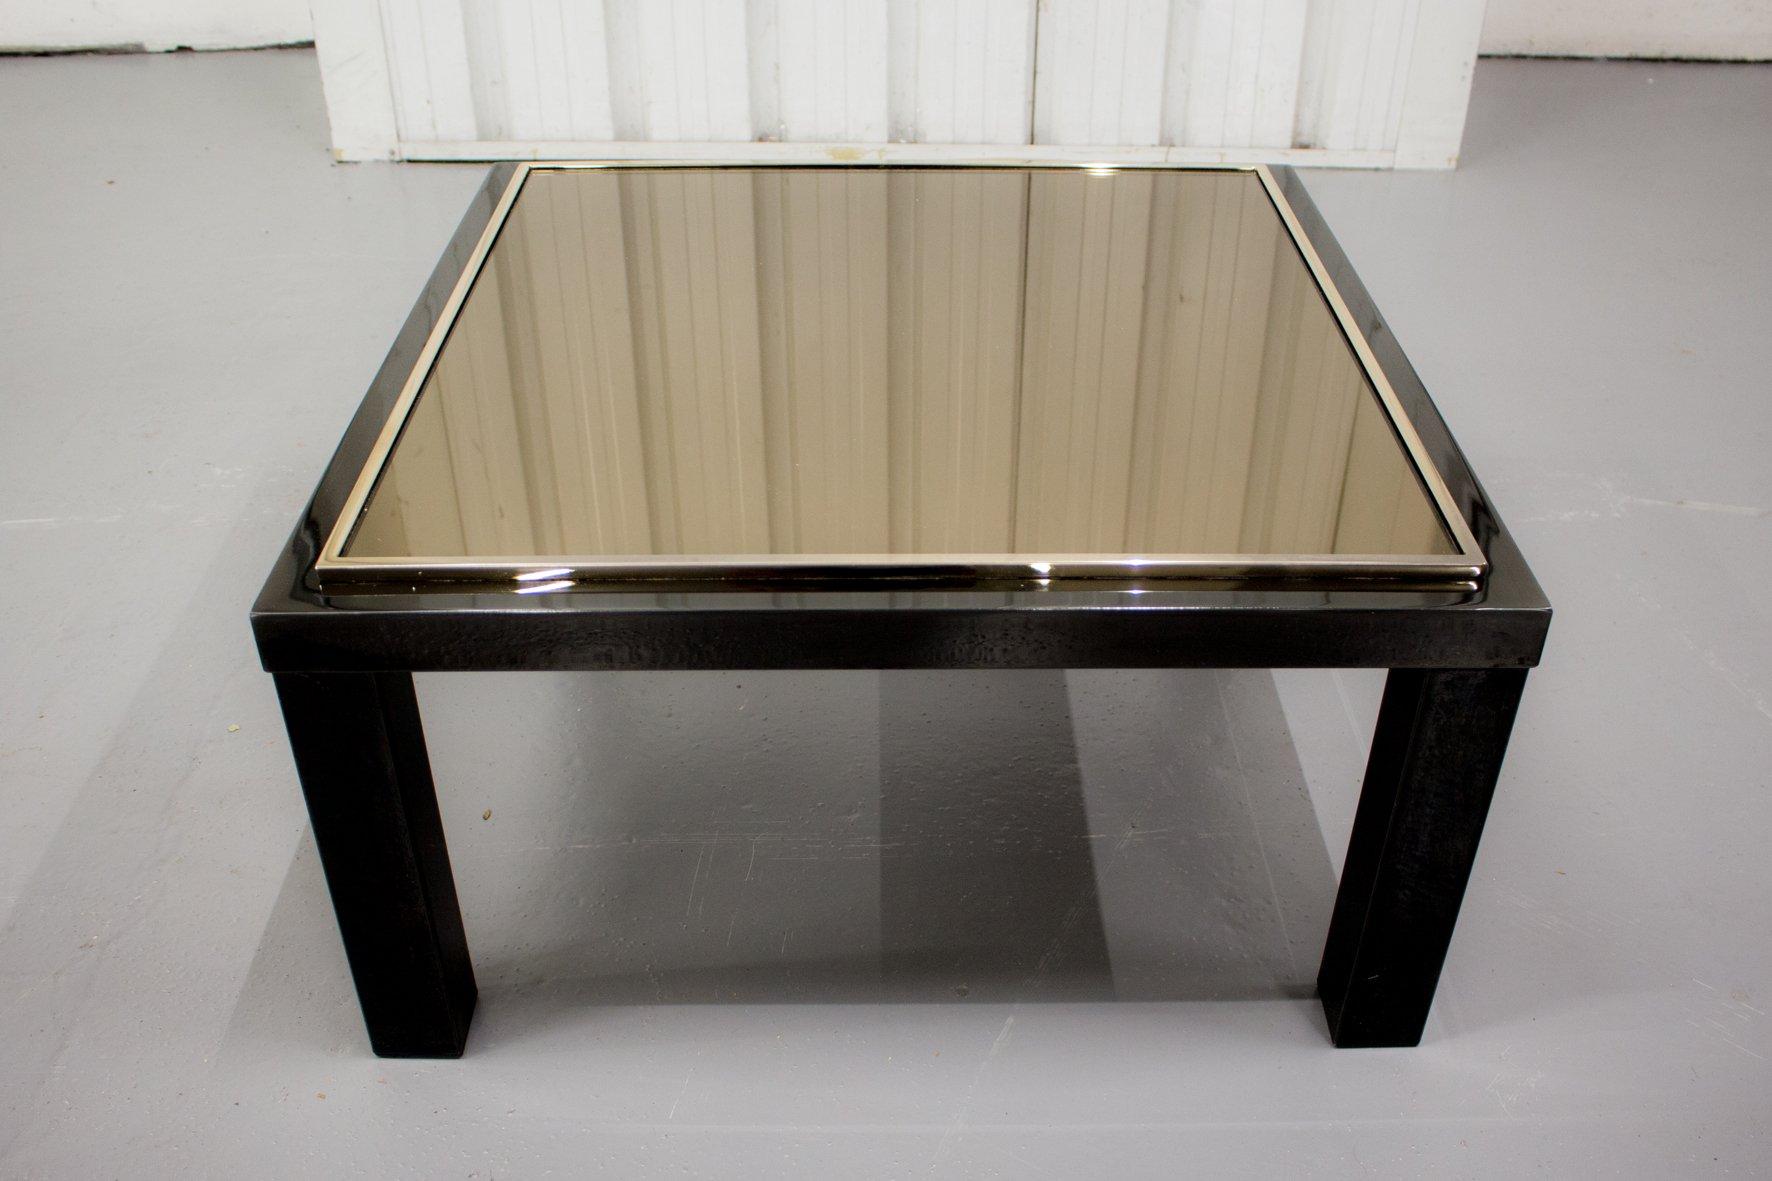 Vintage Black Side Table with 23 Karat Gold Rimmed Top from Belgo ...